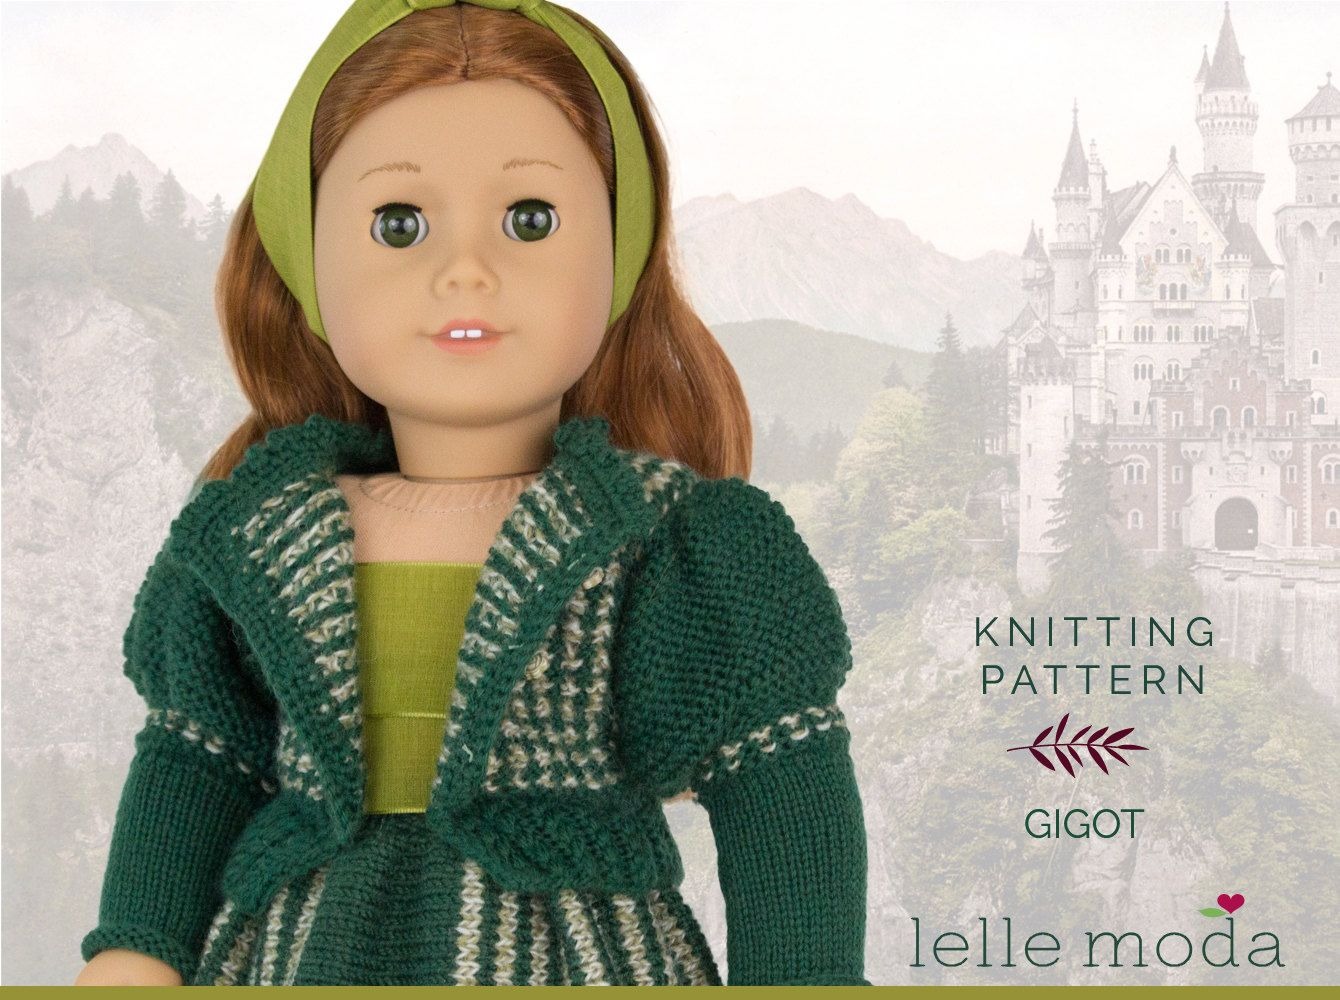 Knitting Pattern - for American Girl Dolls - Gigot Sleeve Cradigan ...